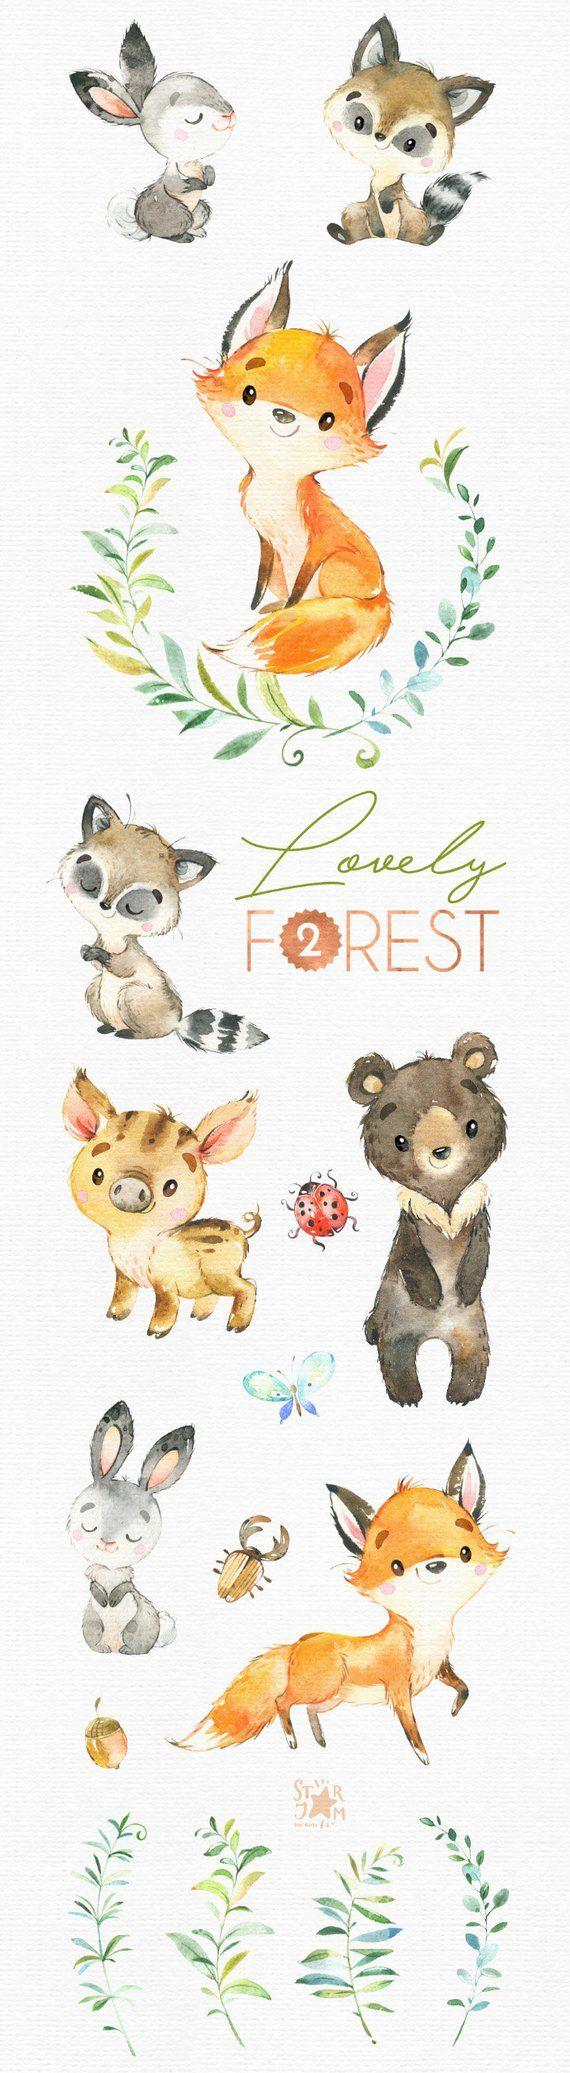 Lovely Forest 2. Little animals clip art, watercolor, fox, wild pig, bear, rabbit, raccoon, florals, wreaths, babyshower, woodland – Sandy Cheeks